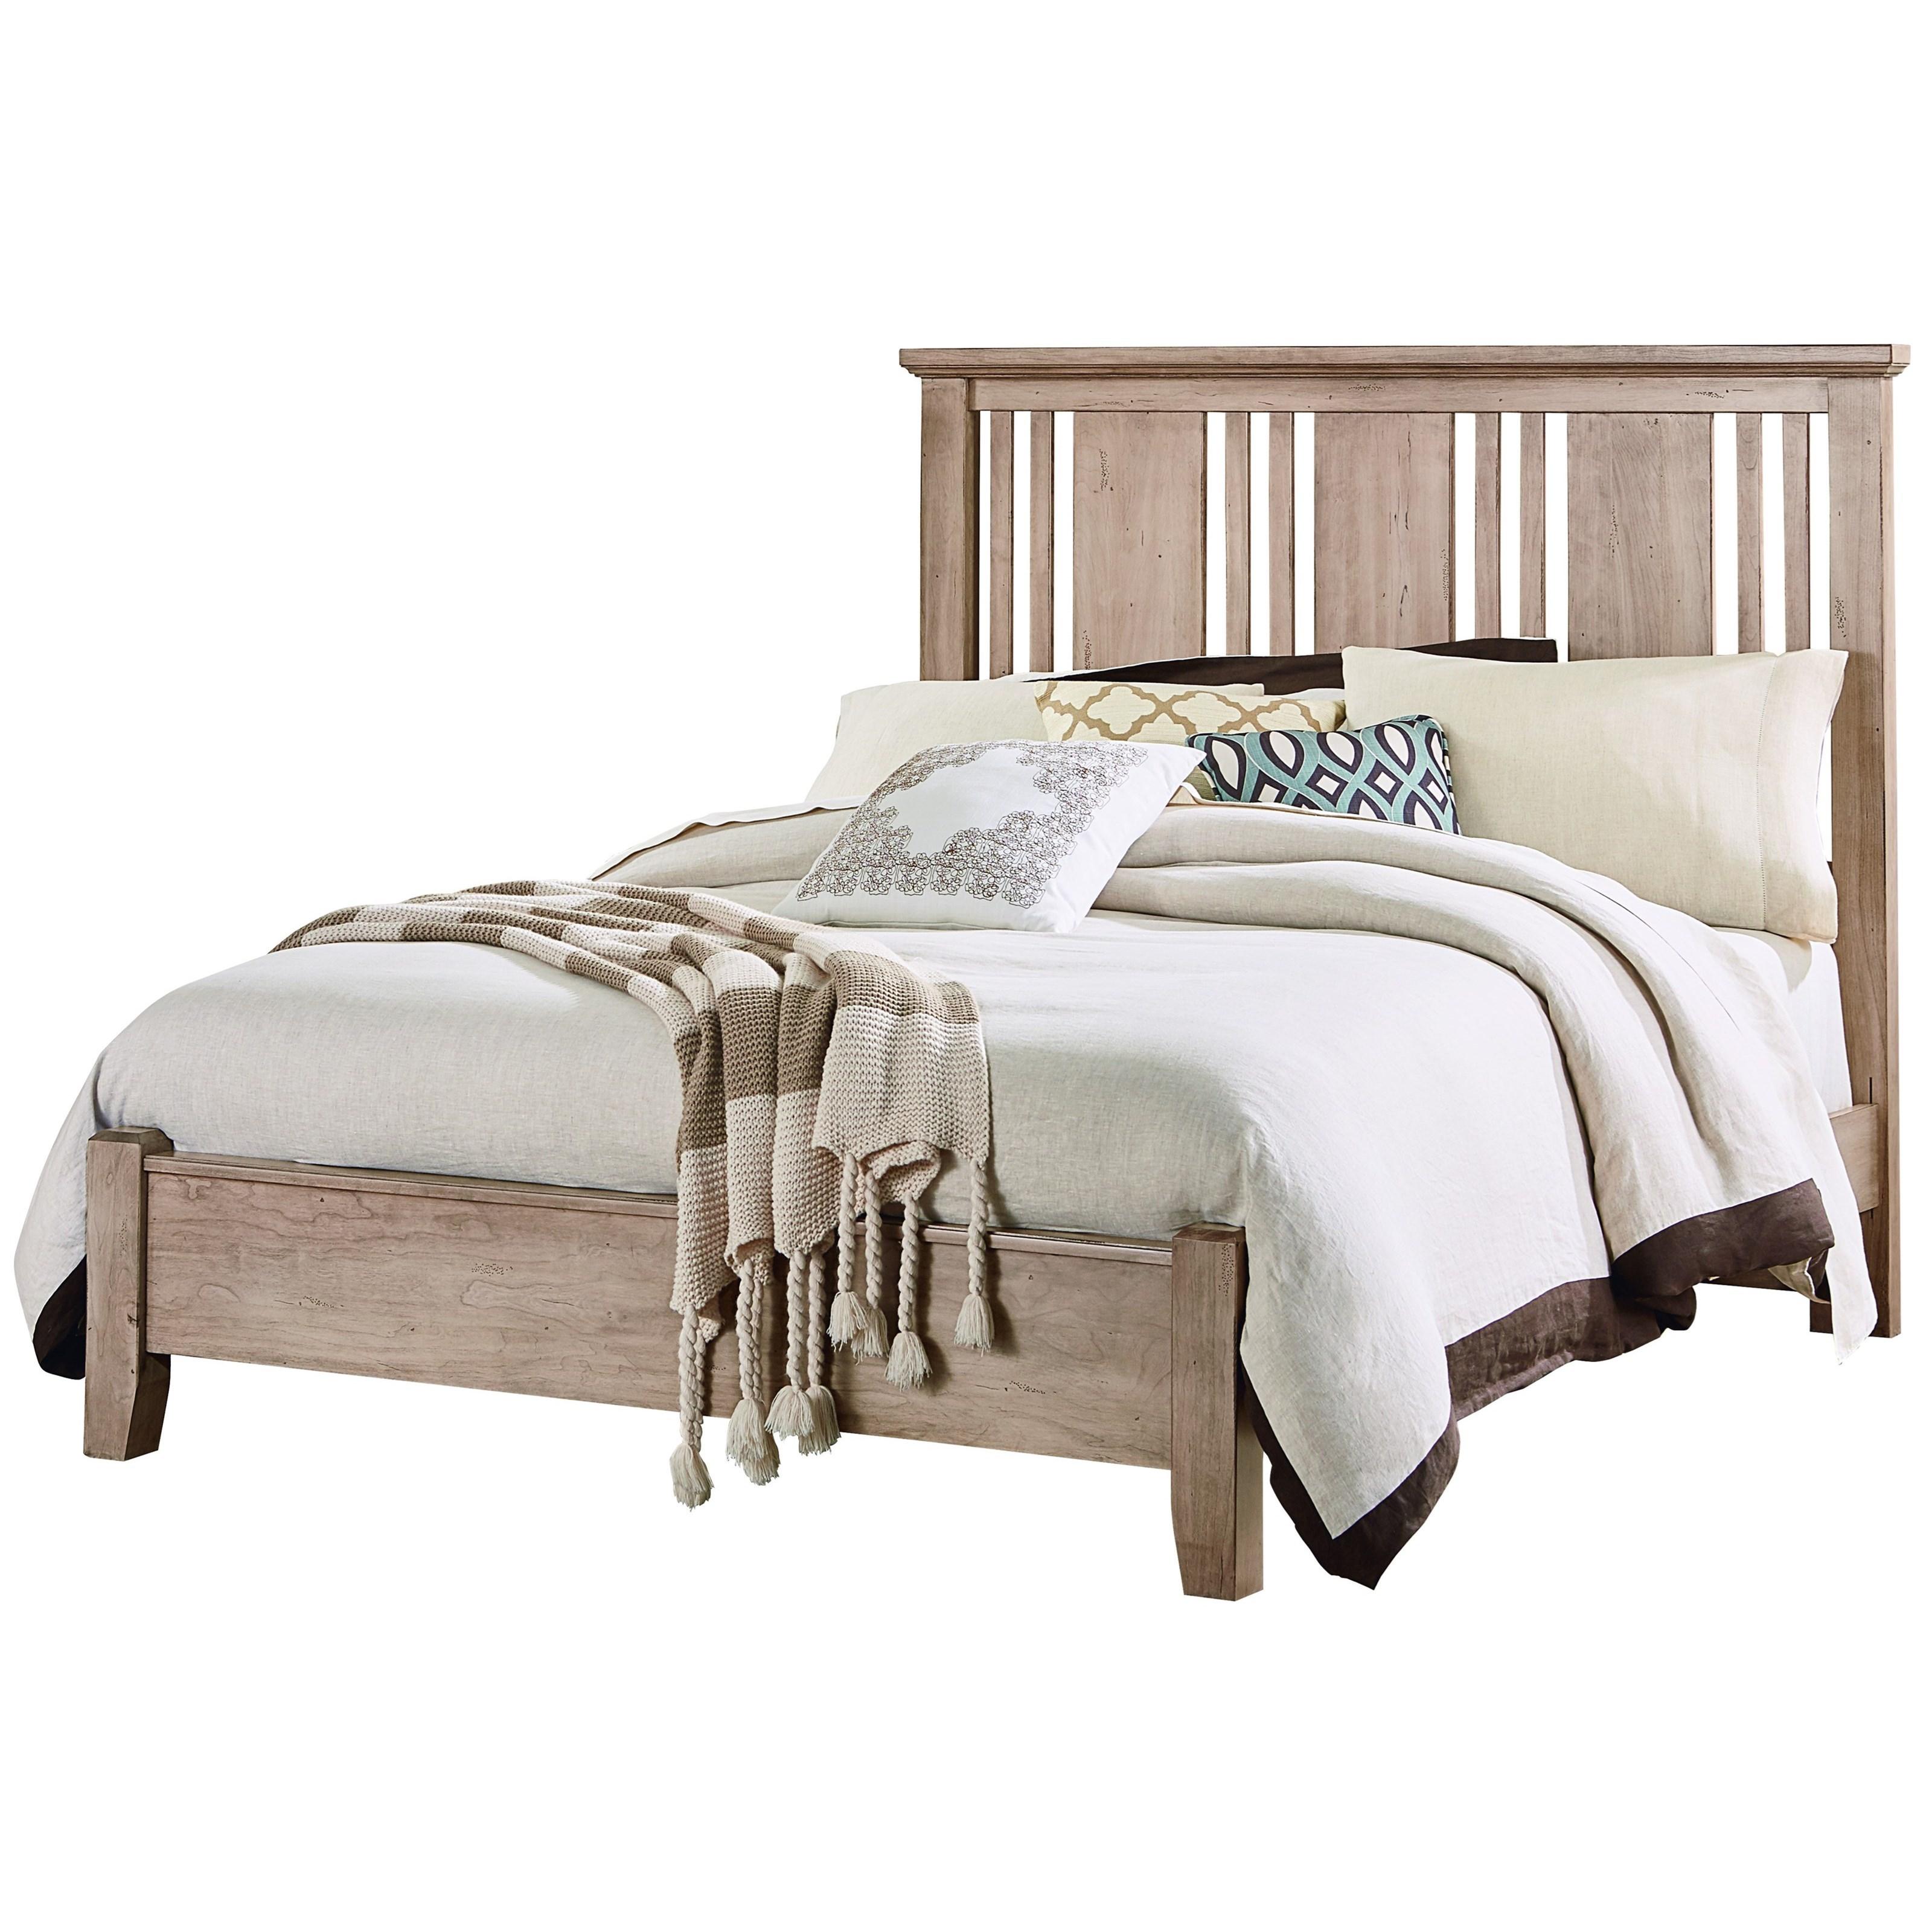 Vaughan Bassett American Cherry King Craftsman Bed - Item Number: 418-667+766+922+MS2